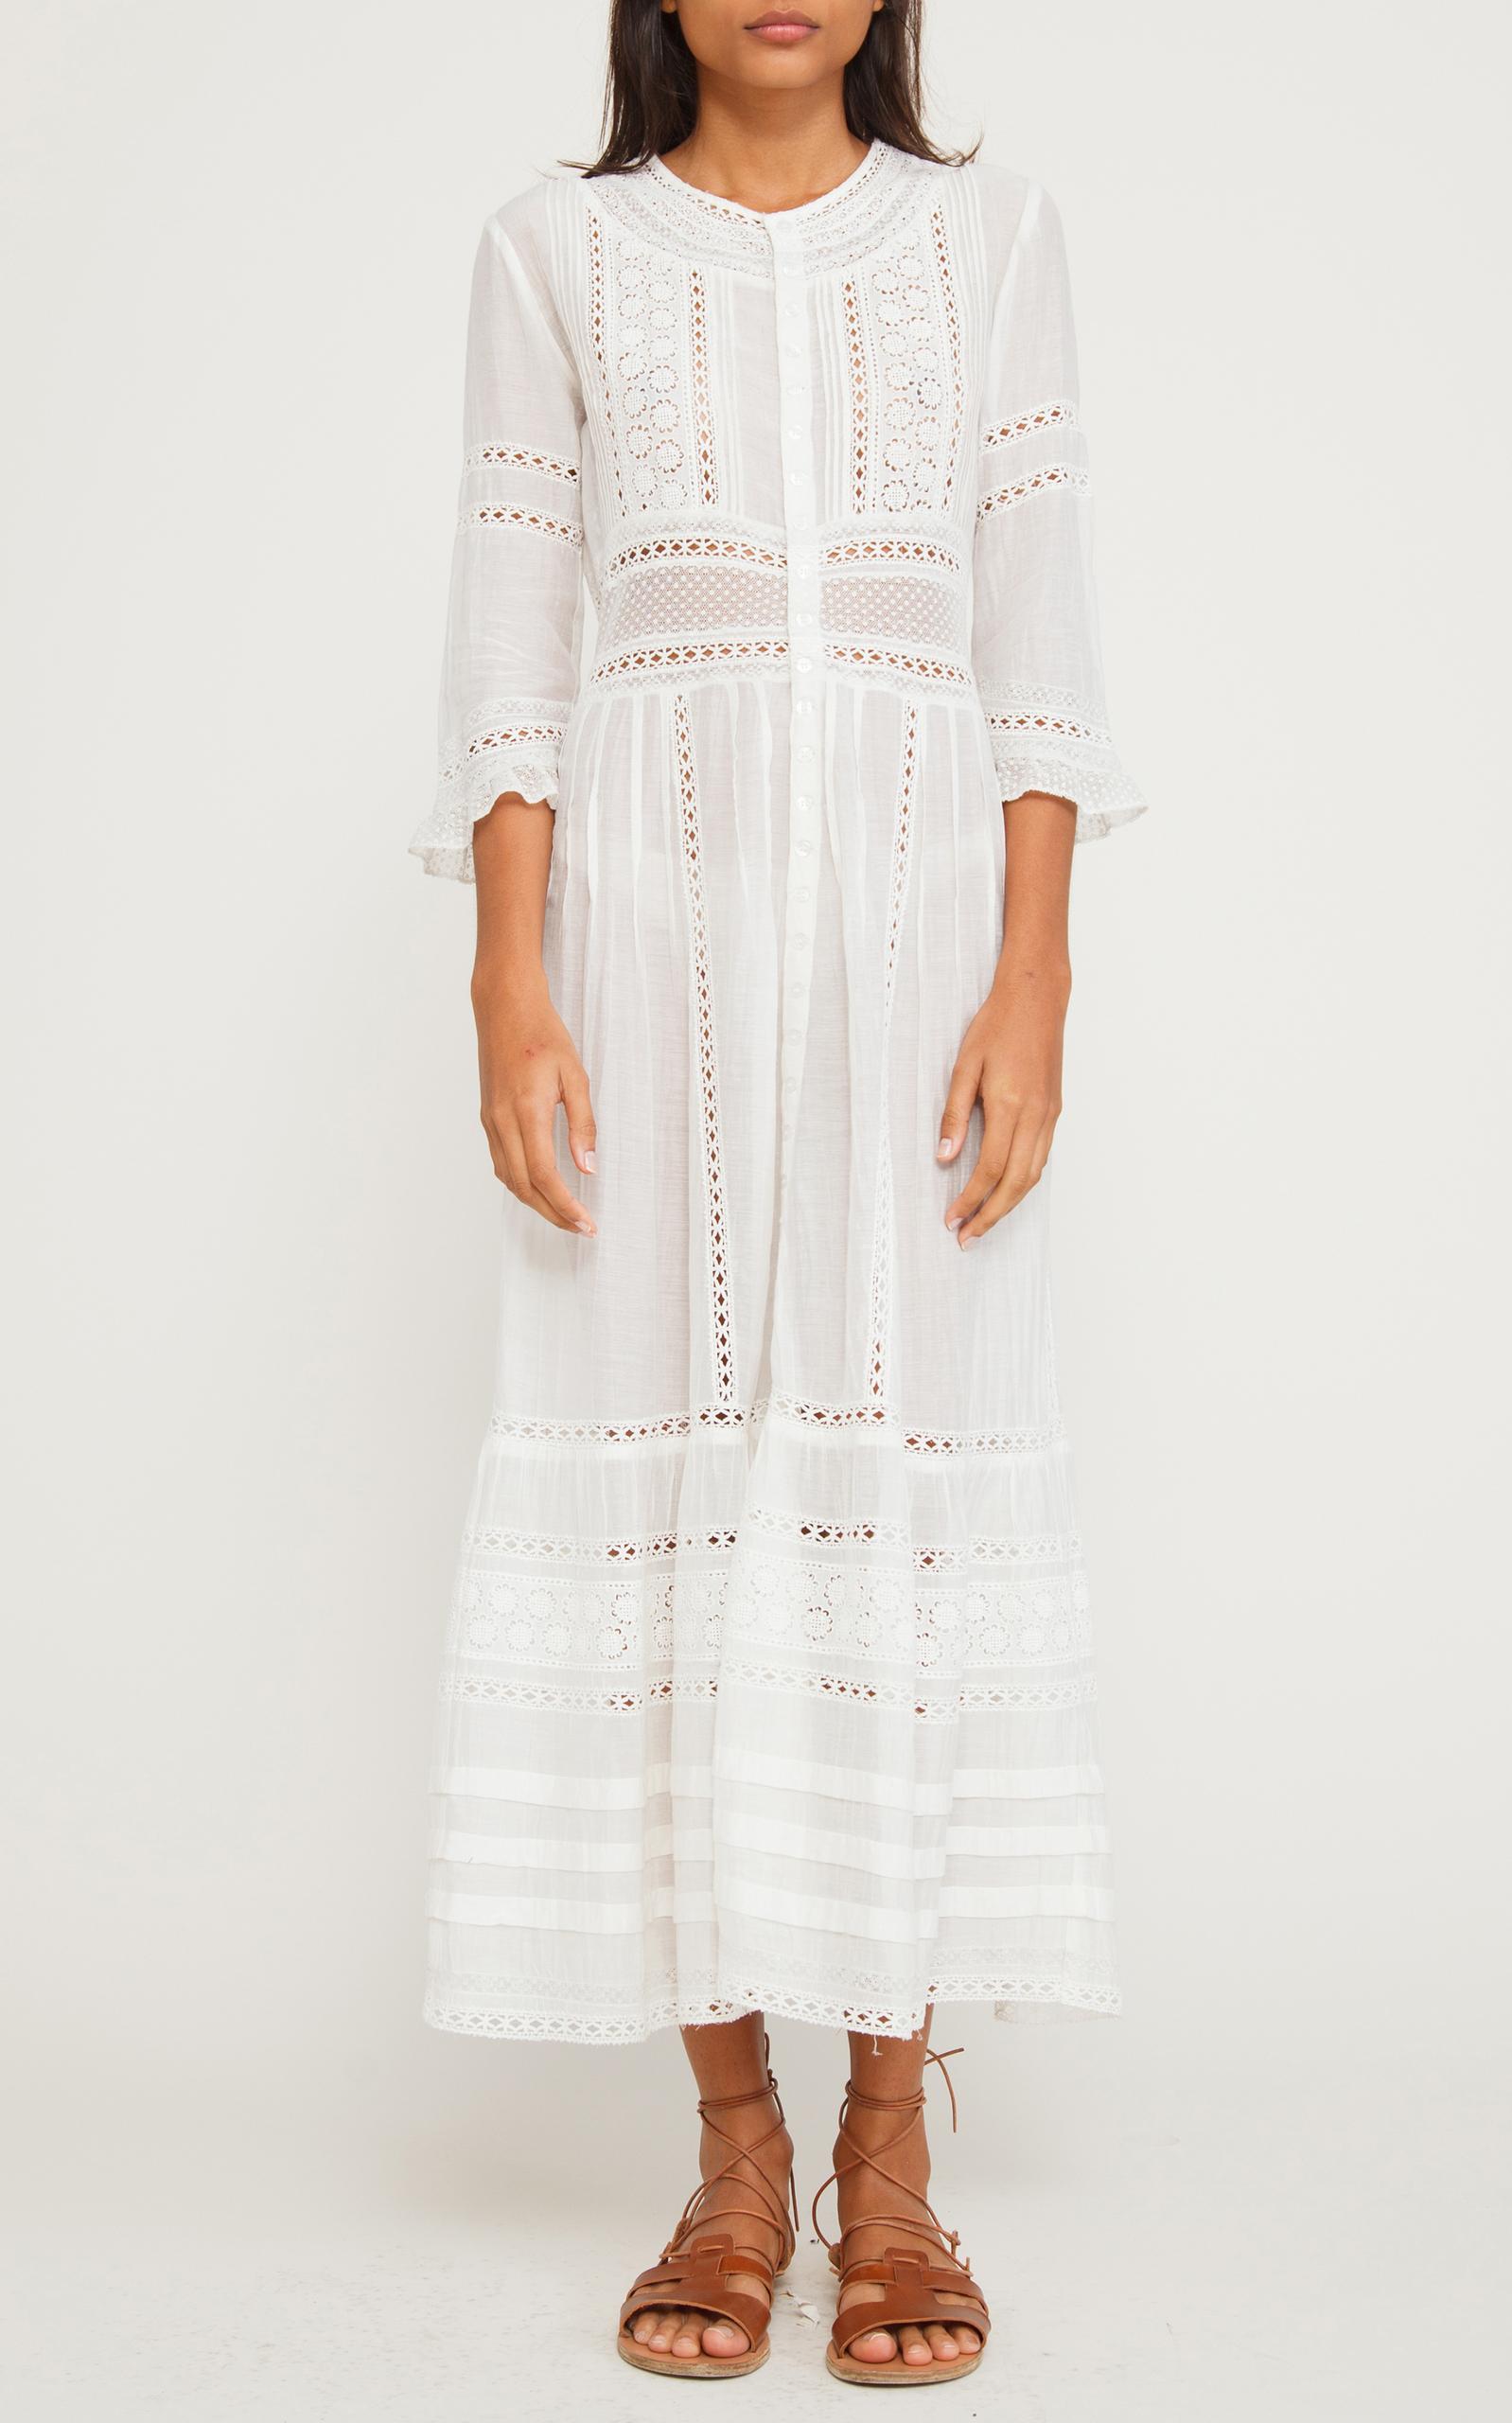 8874d9cb5b64 Sevi Lace Maxi Dress by Sea